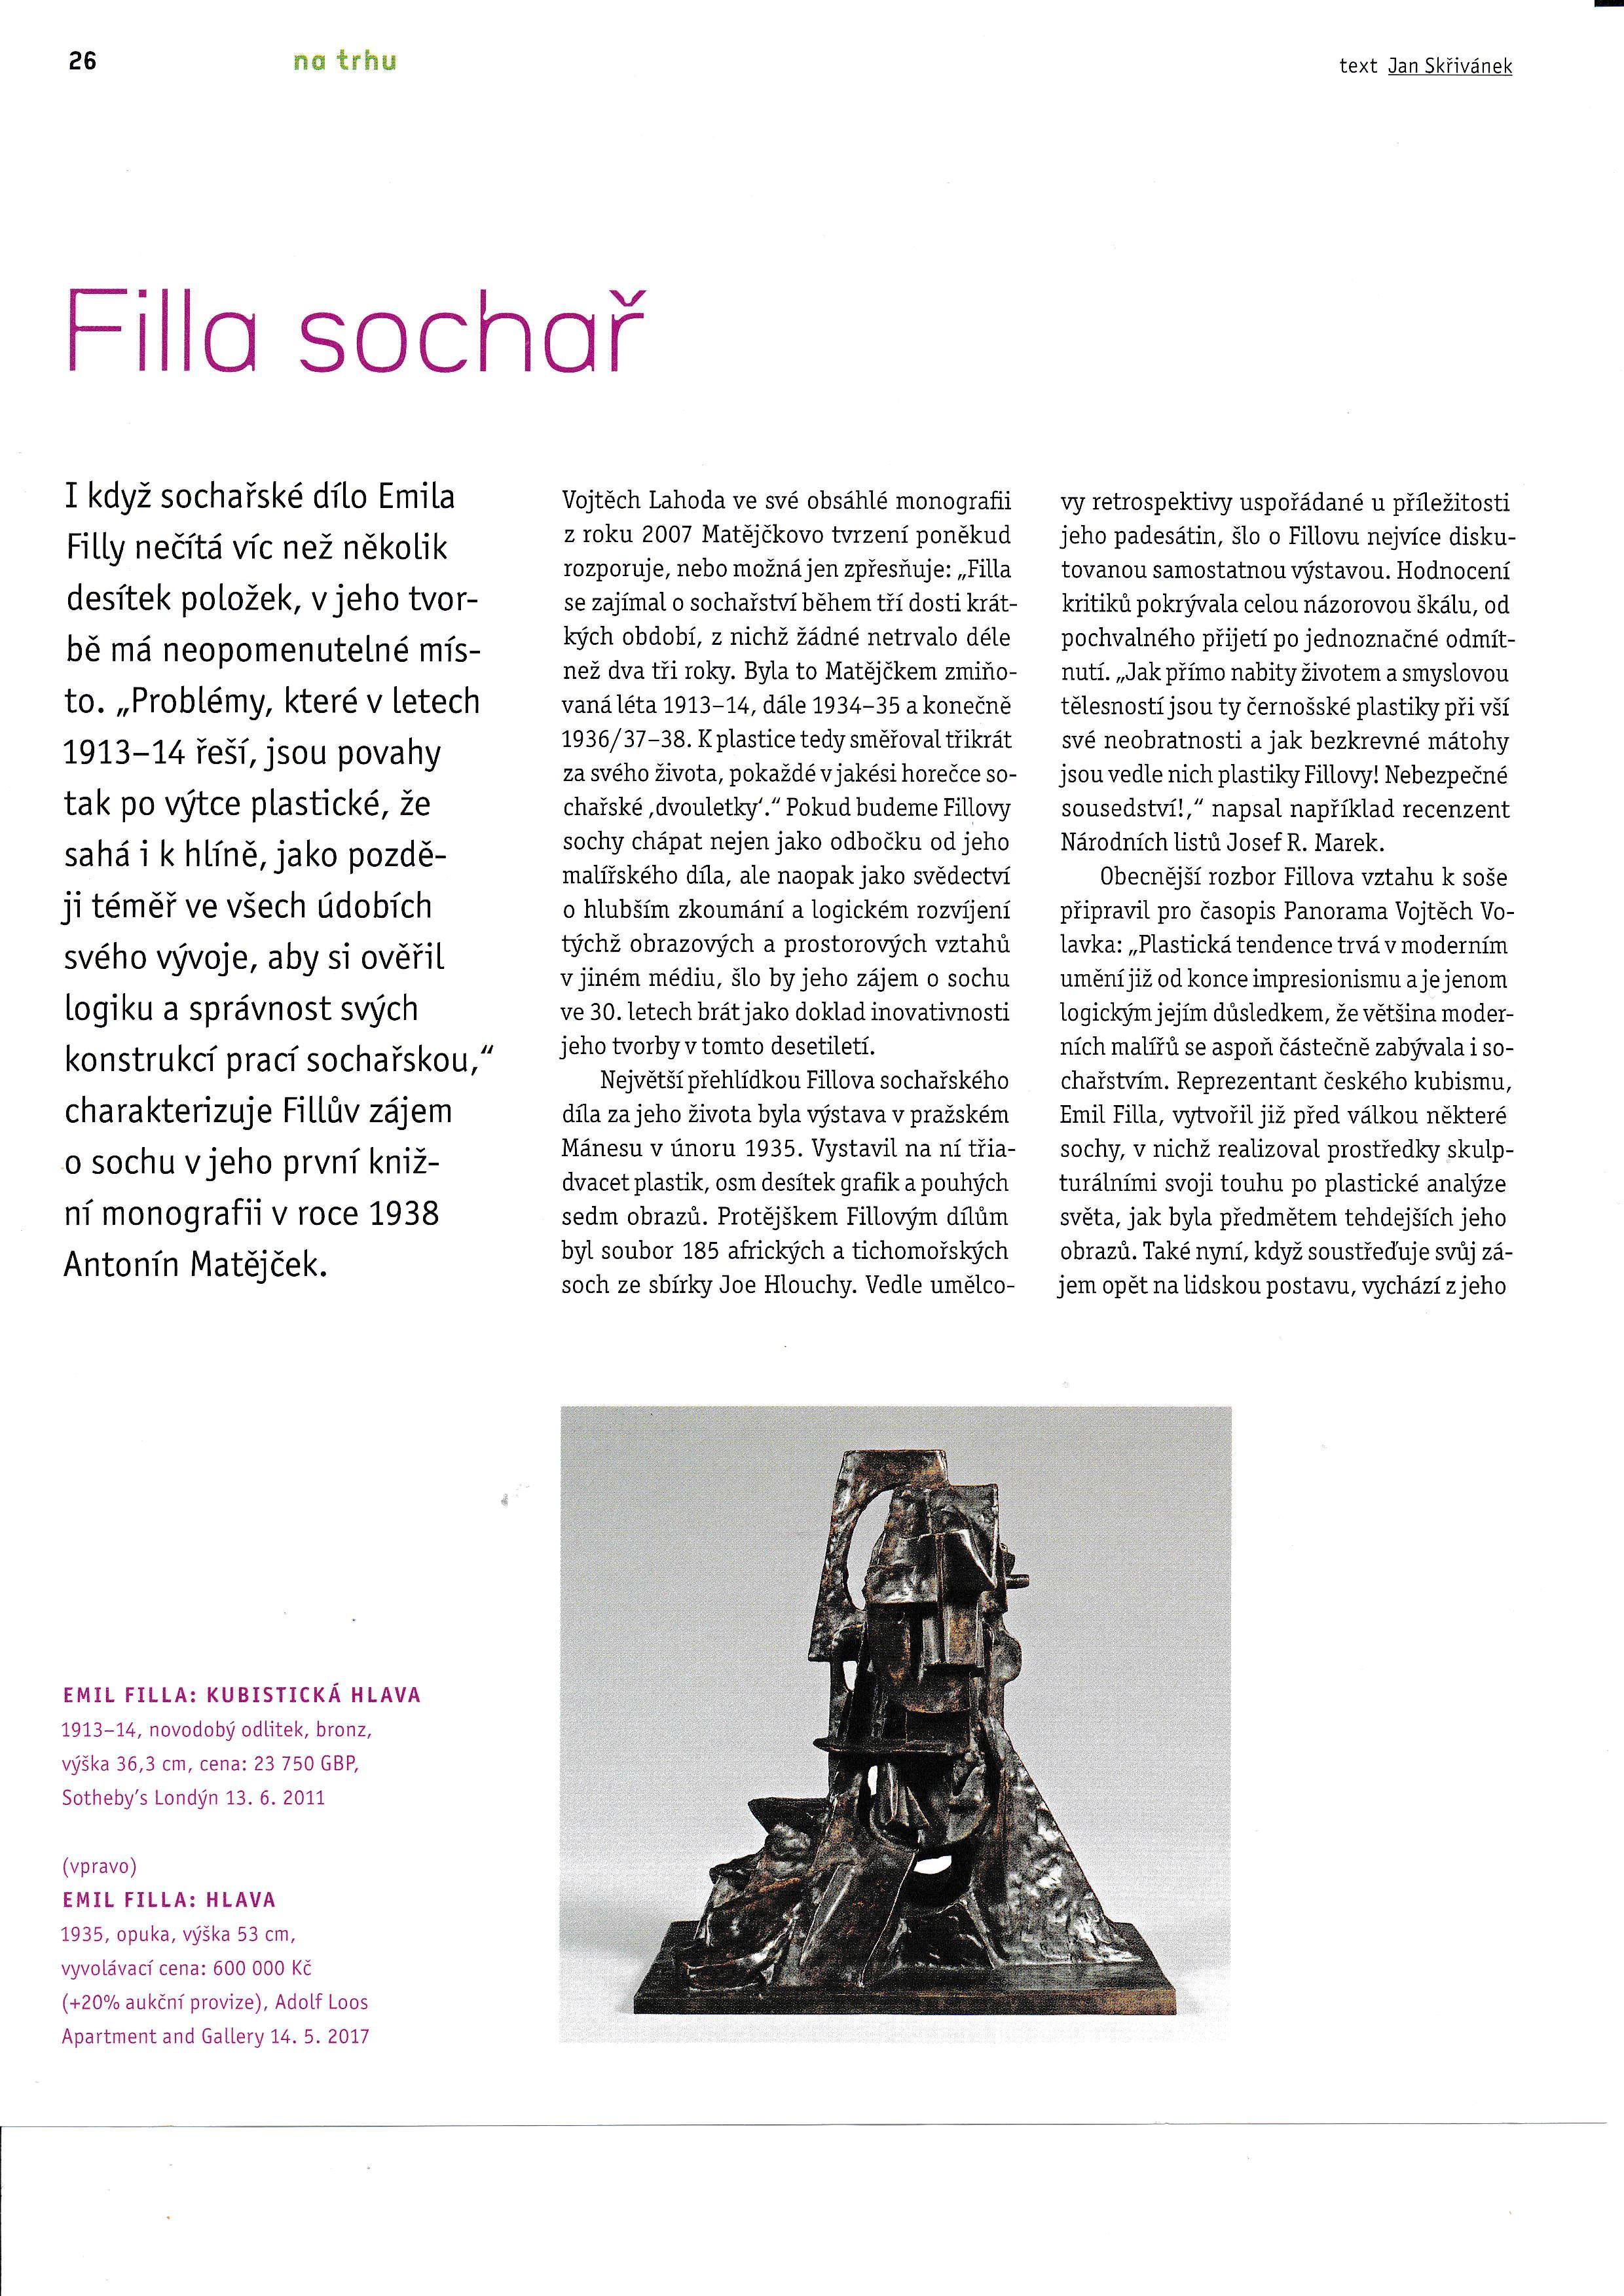 Filla sochař (Art + Antiques 04/2017) s.1